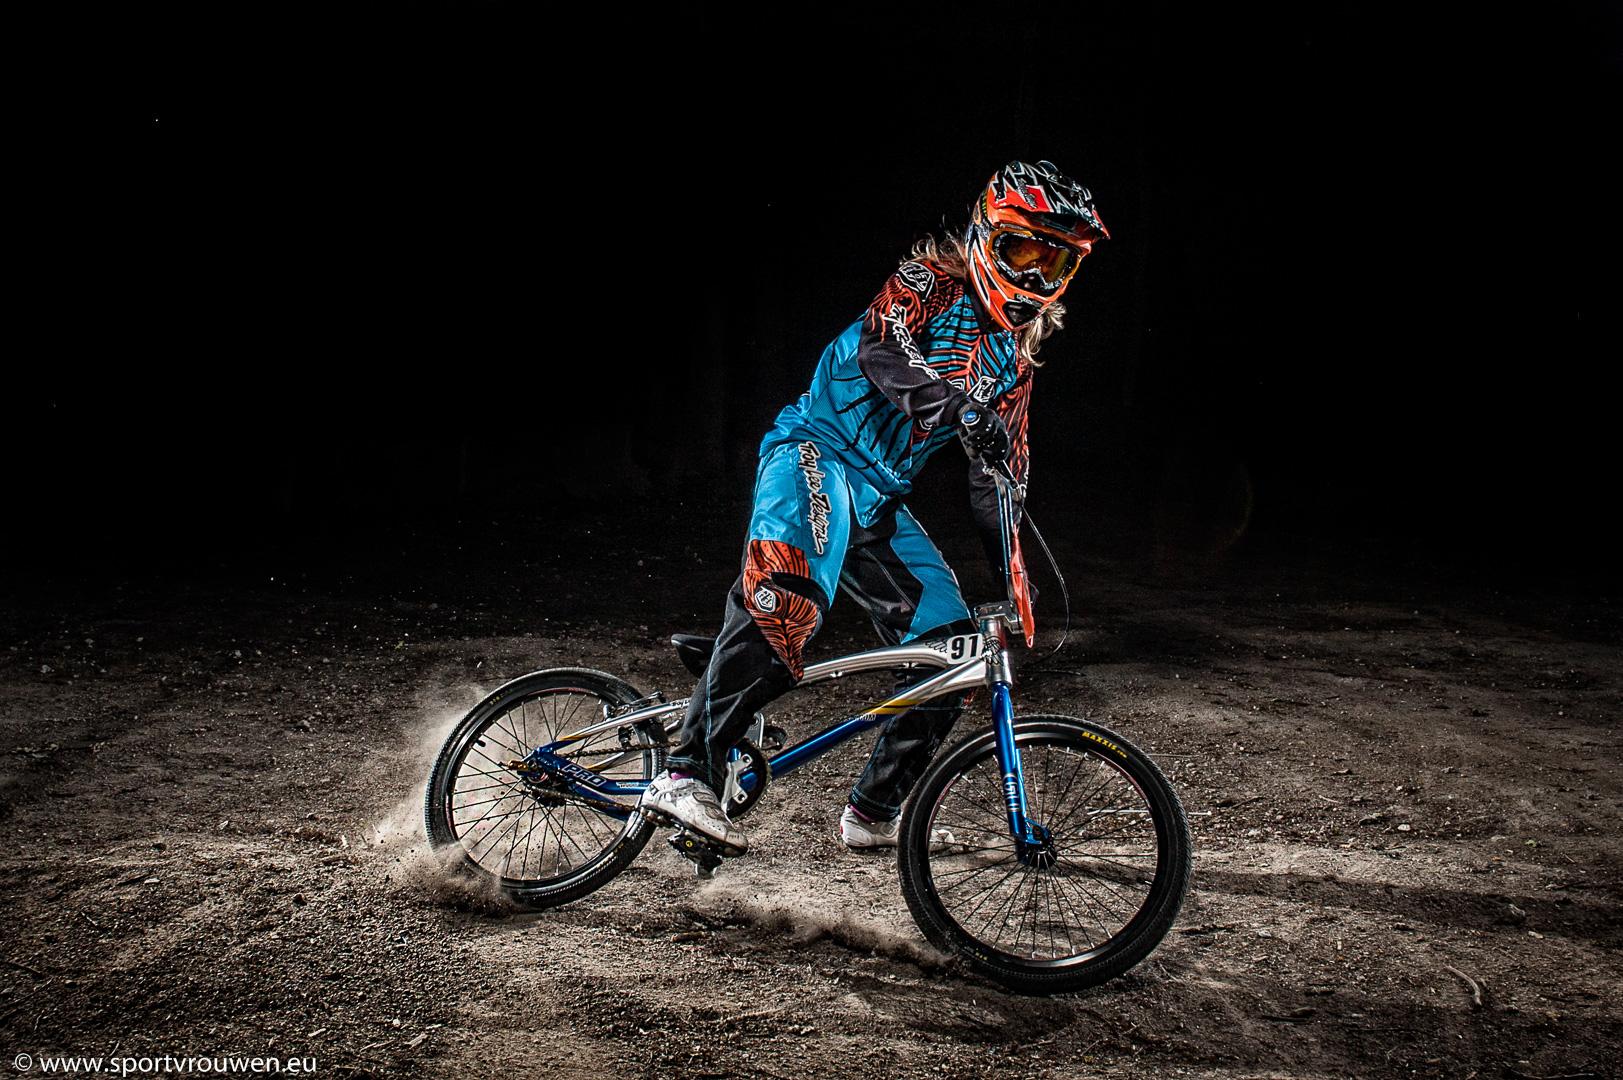 Sportvrouwen : BMX